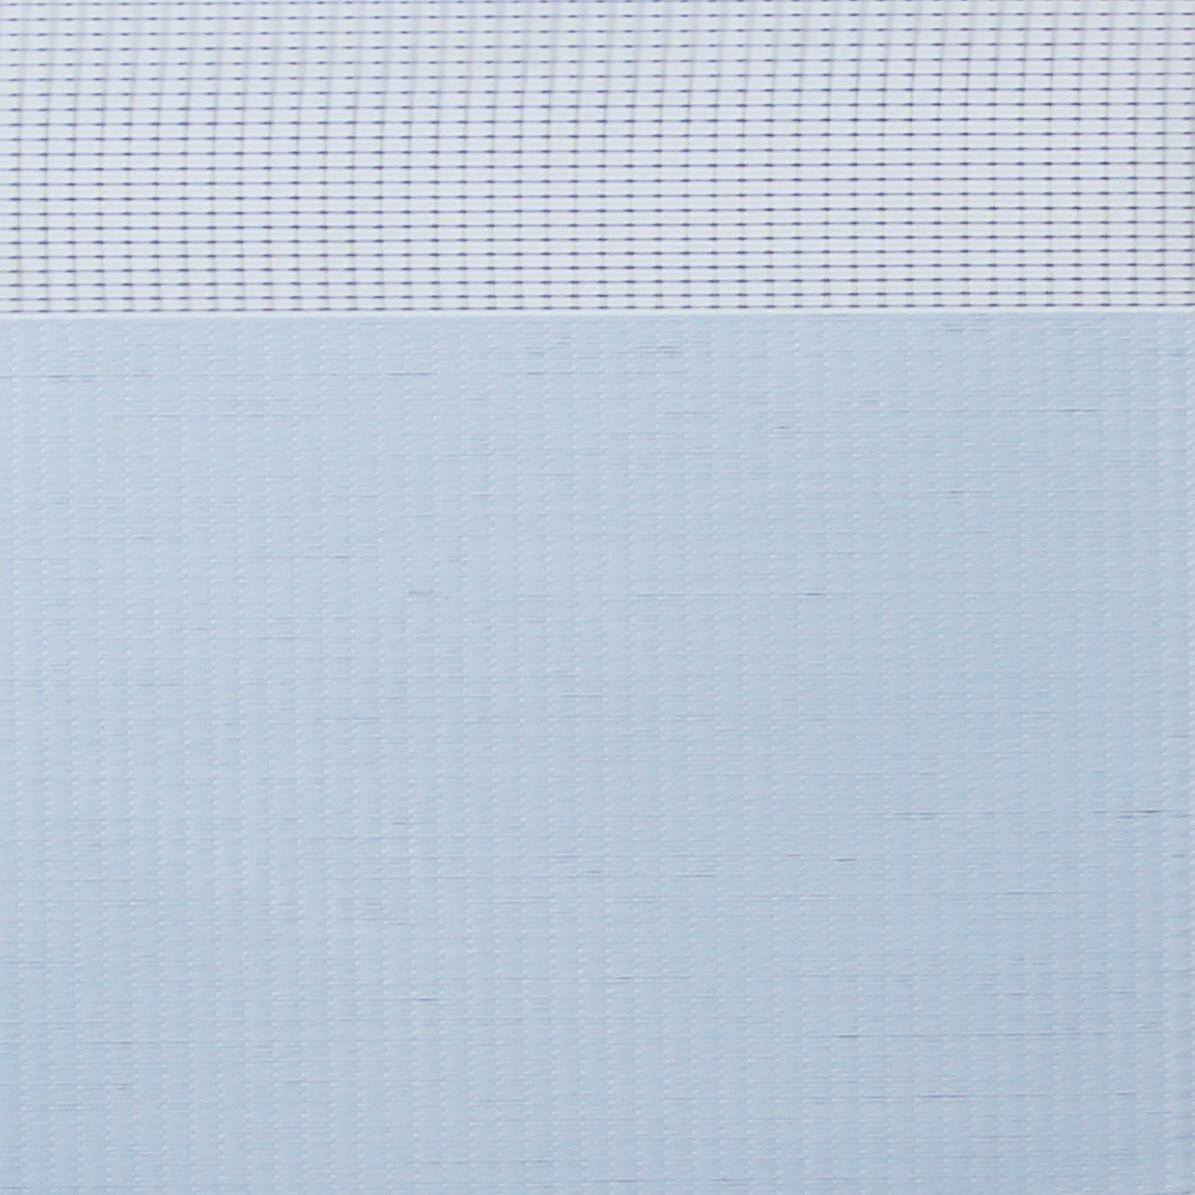 Рулонные шторы День-ночь Ткань Марго блэкаут Белый